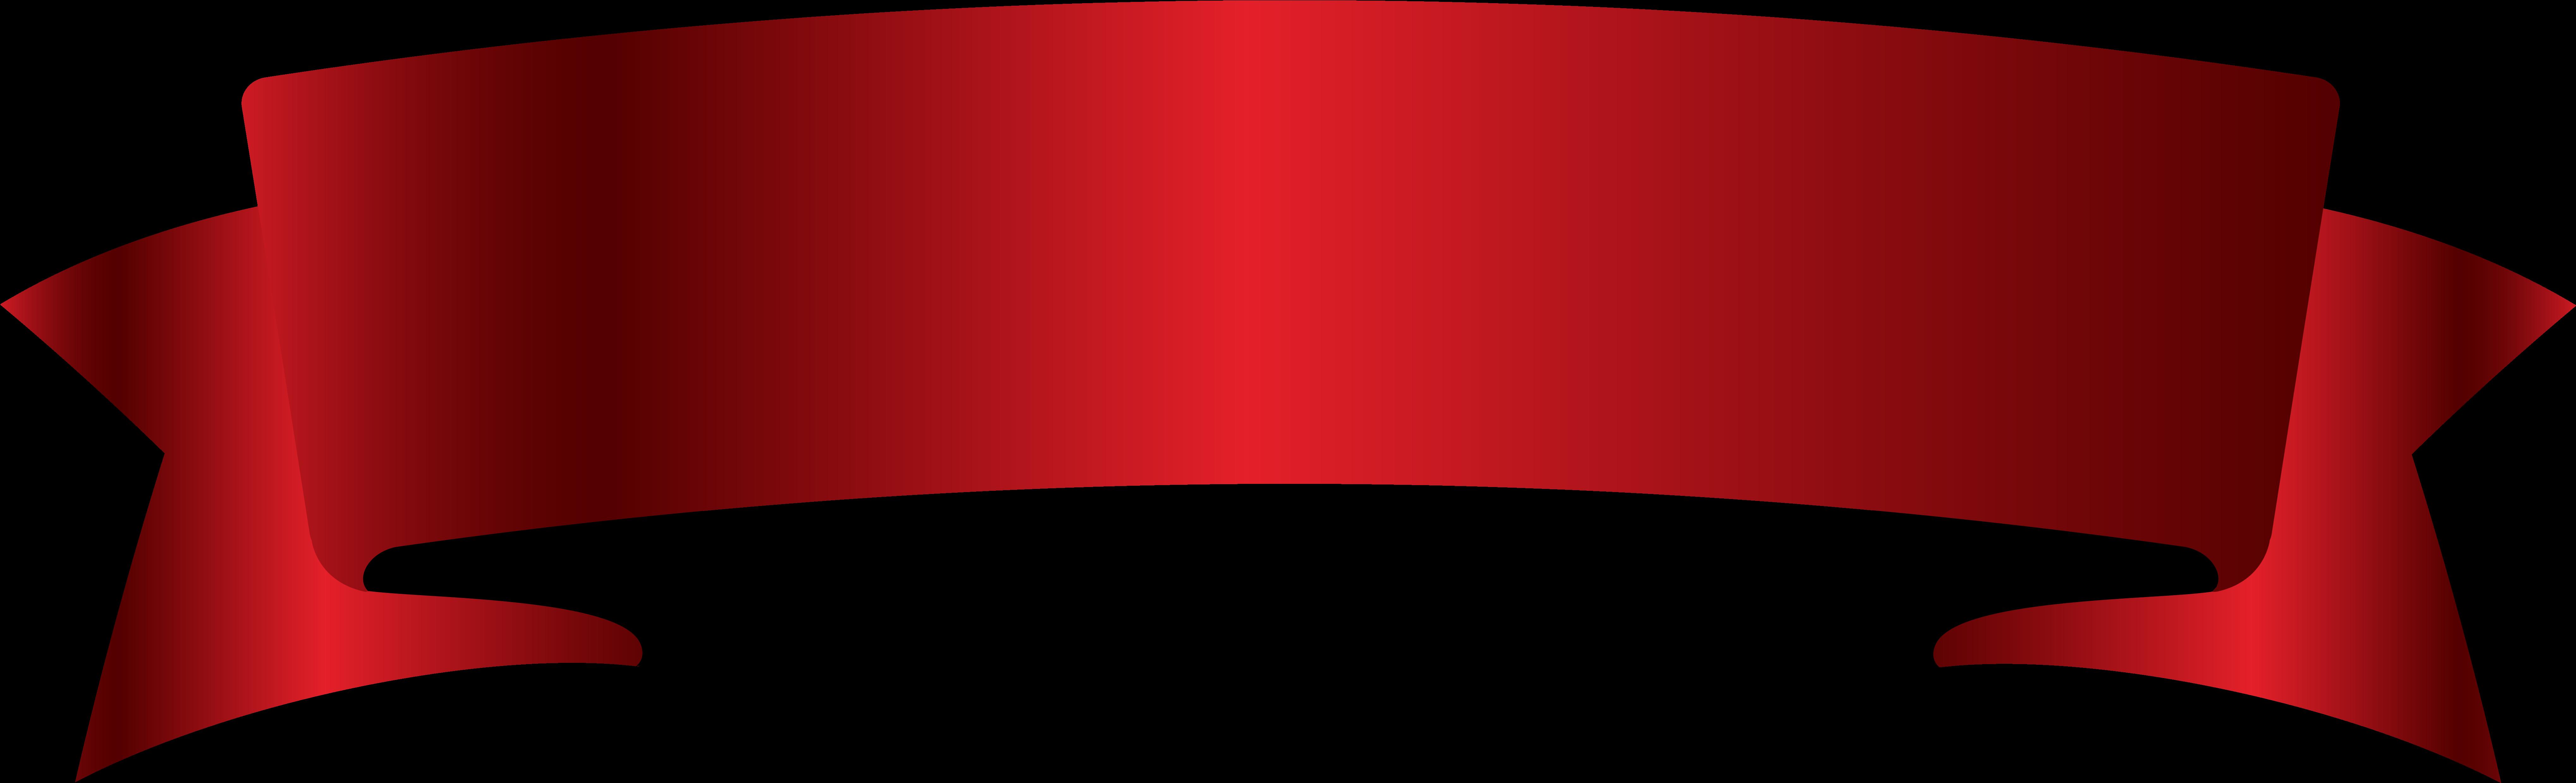 Лента картинка для фотошопа